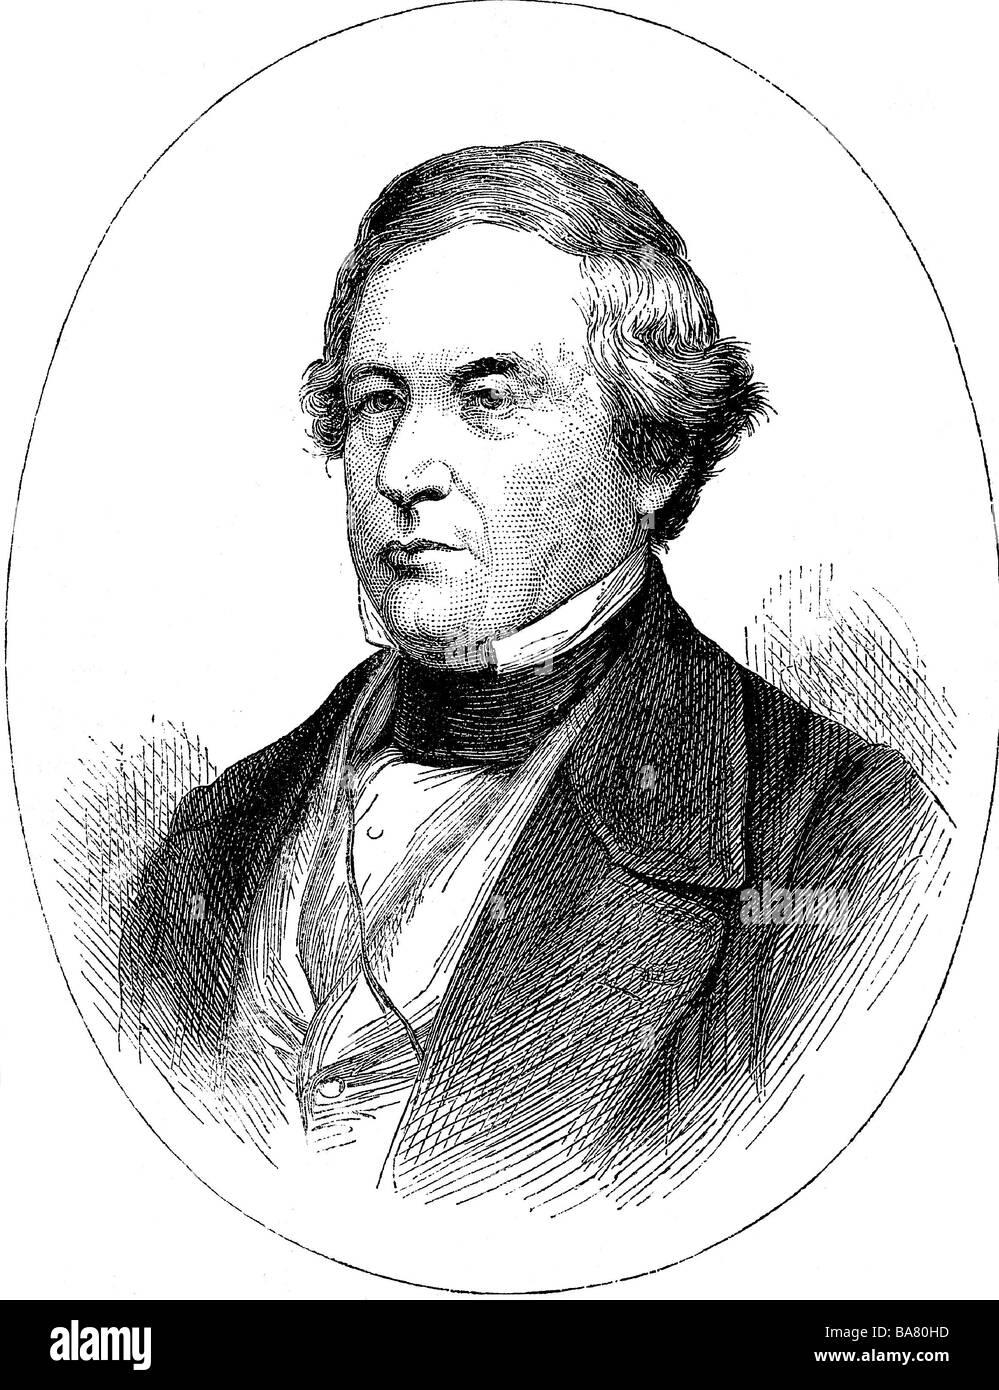 Fillmore, Millard, 7.1.1800 - 8.3.1874, American politician (Whig), 13th US President 1850 - 1853, portrait, wood Stock Photo